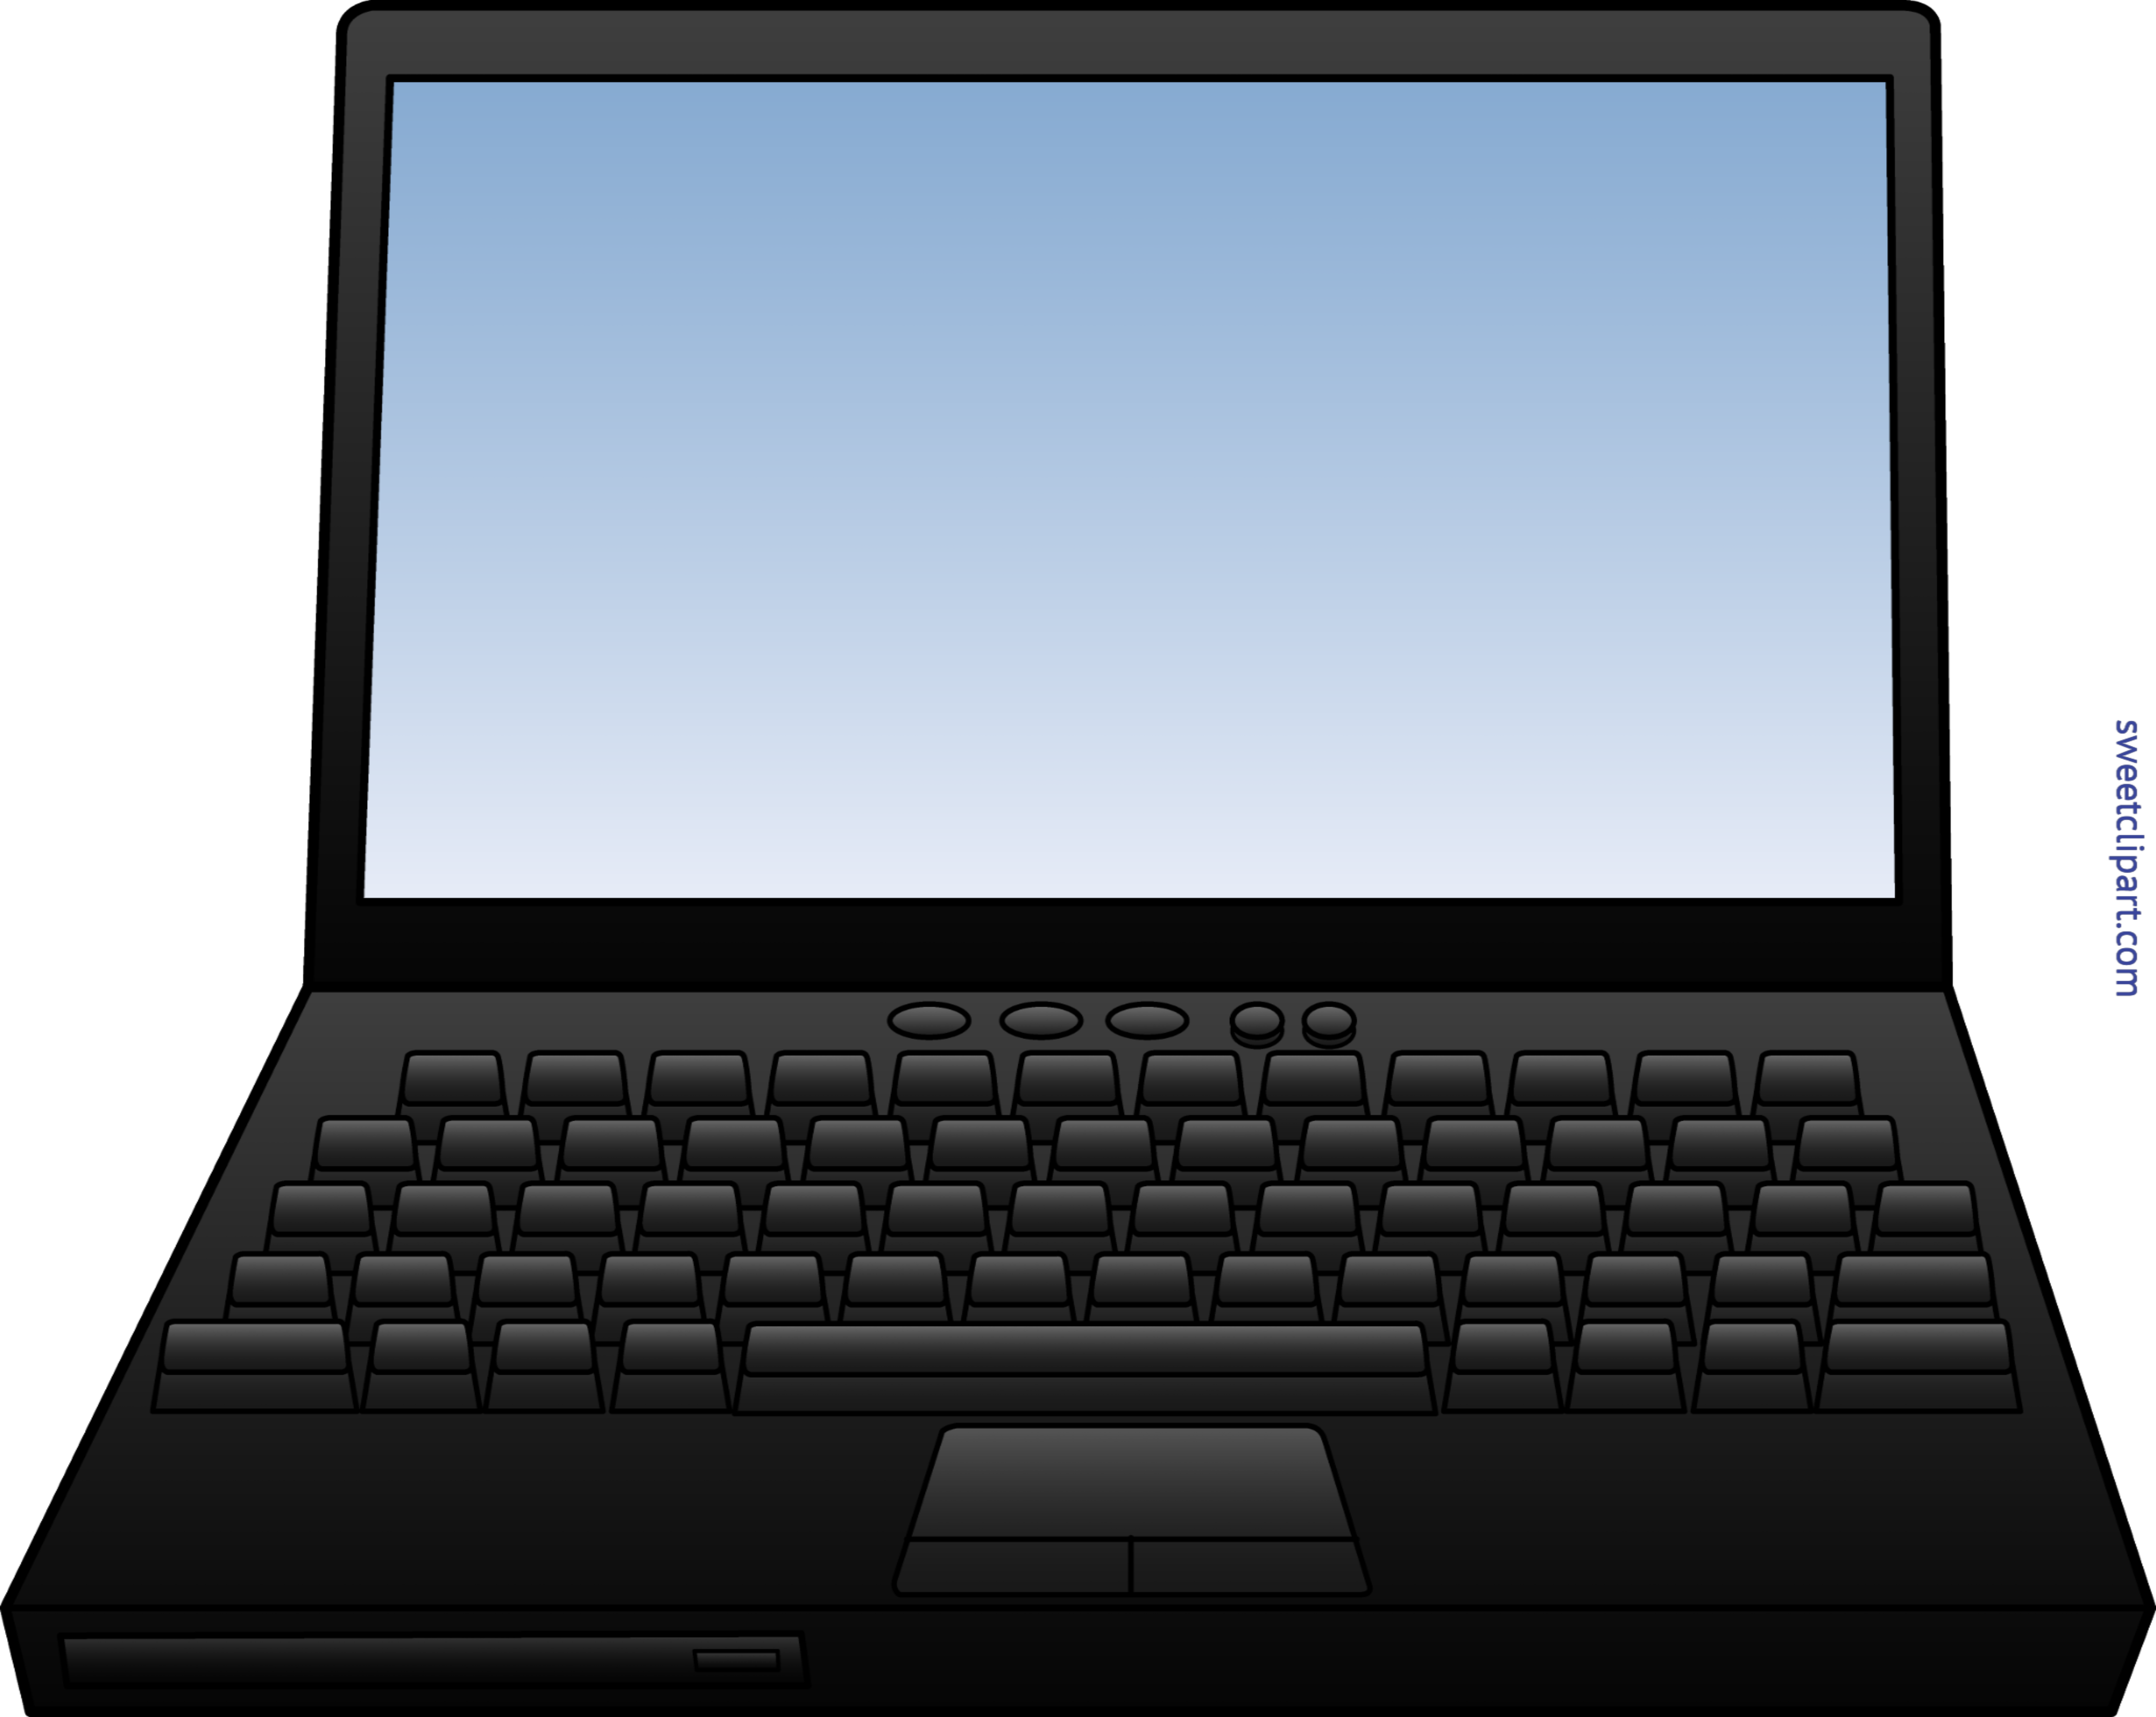 Laptop Computer Clip Art.